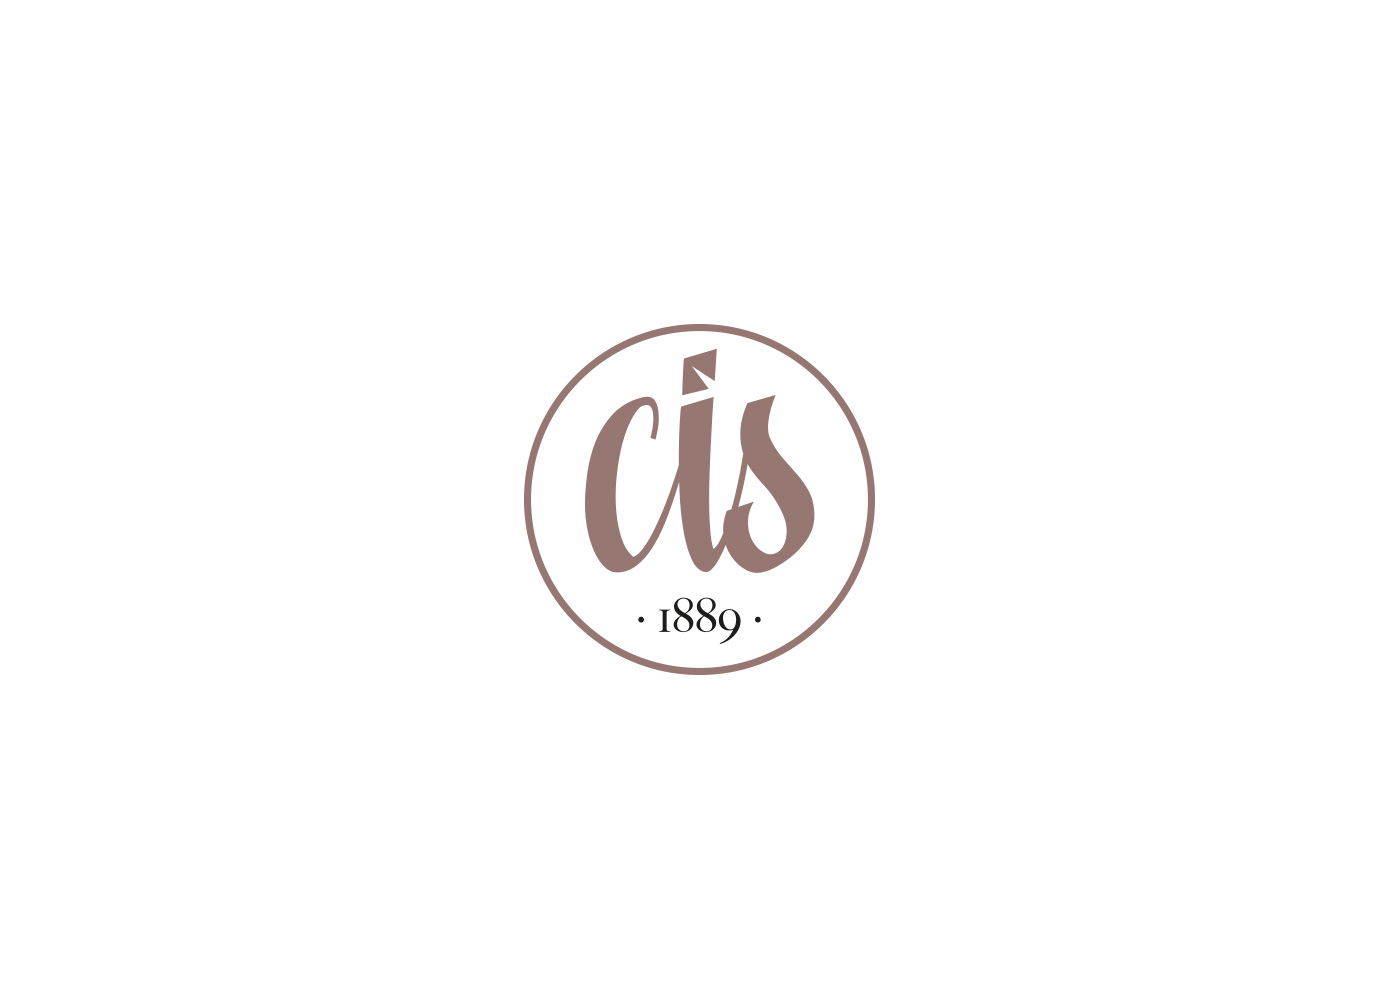 02 Macelleria cis logotipo grafico milano